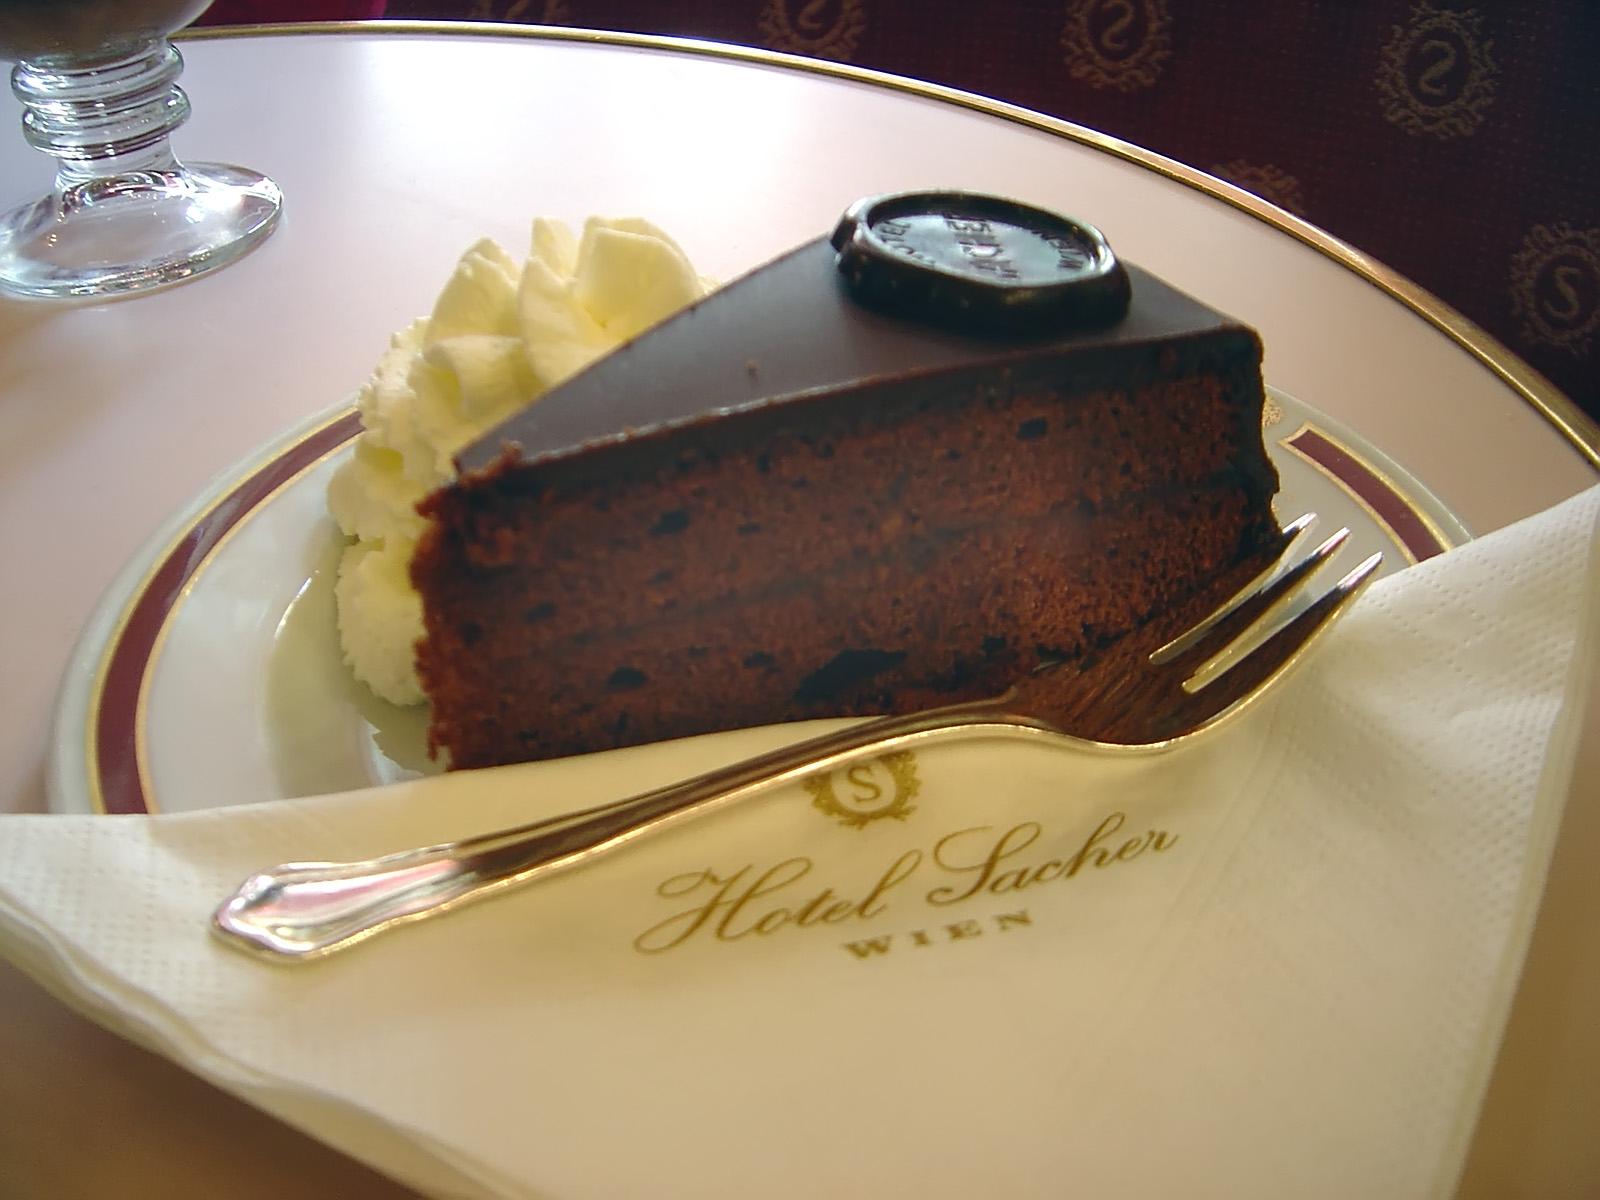 ... torte chocolate ganache torte chocolate pistachio torte recipe sacher